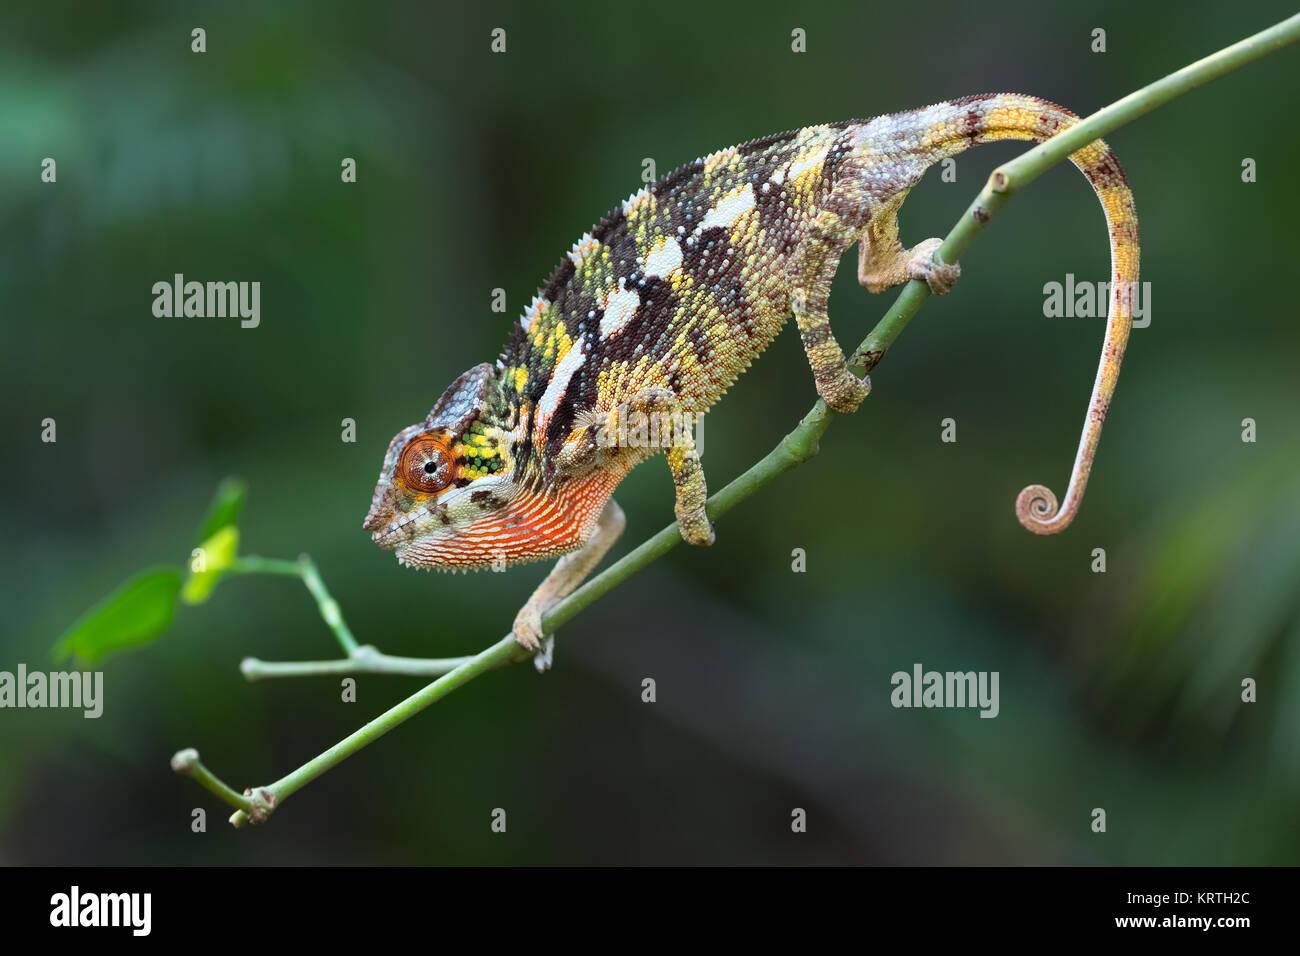 Panther chameleon (Furcifer pardalis) Stockbild